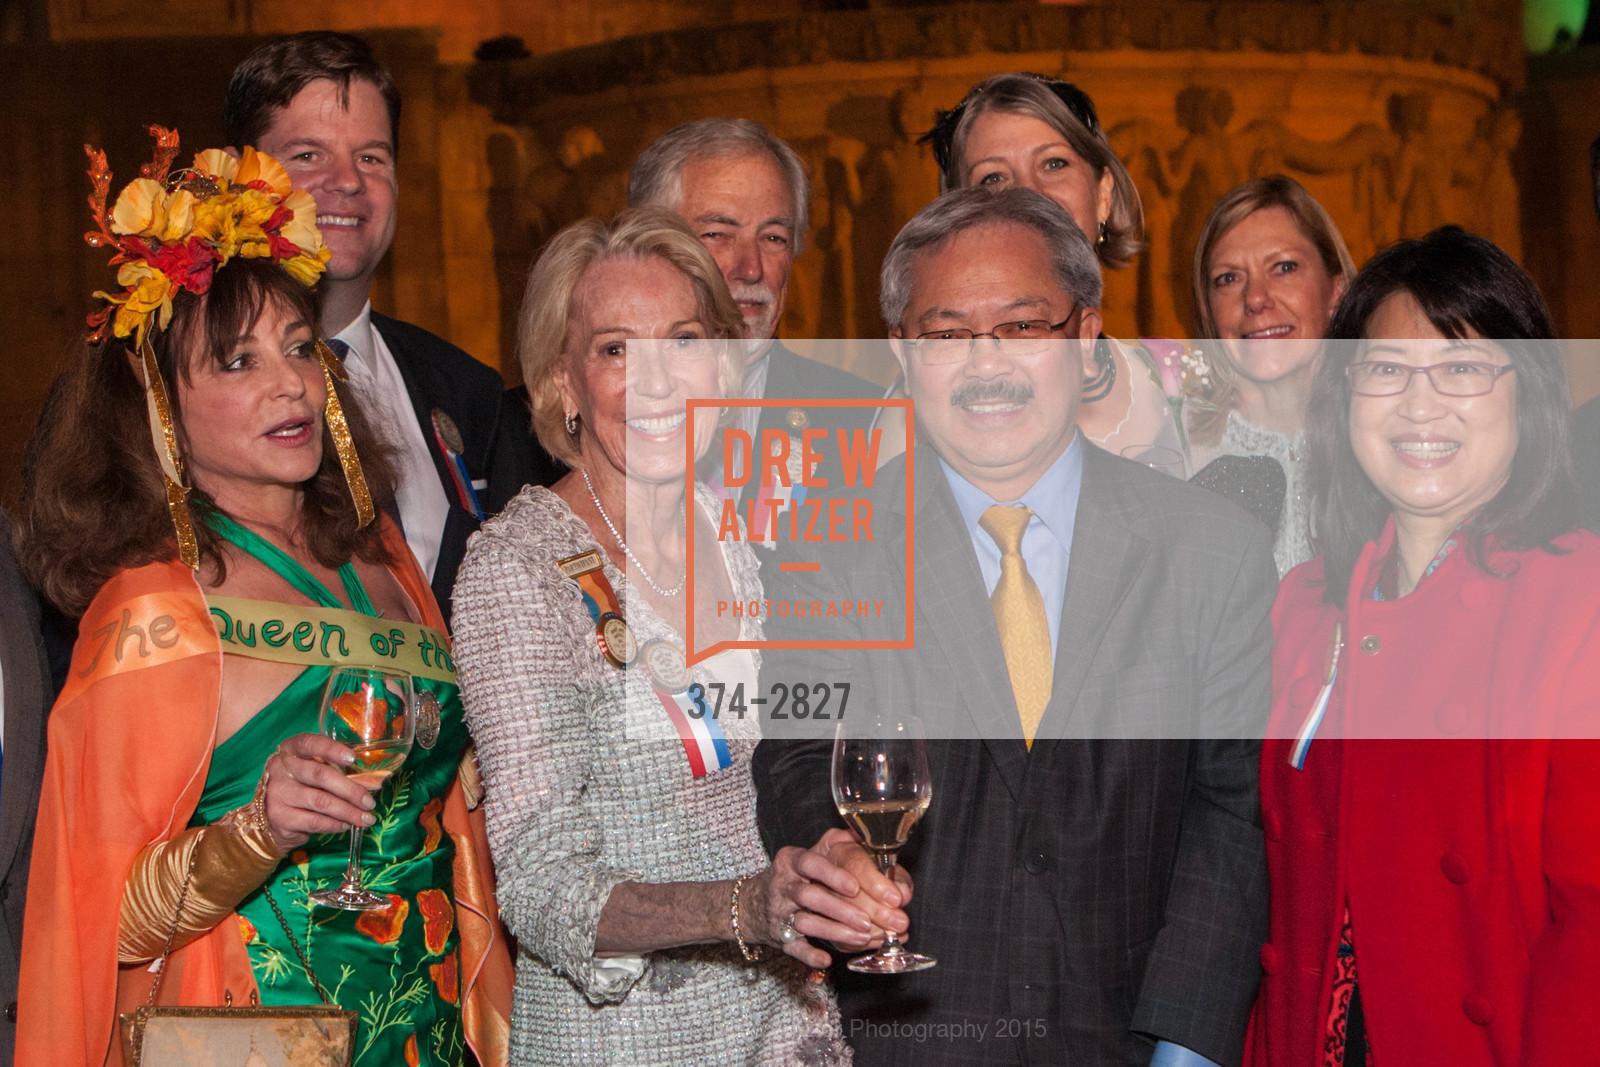 Donna Huggins, Mark Farrell, Charlotte Shultz, Mark Buell, Ed Lee, Anthea Hartig, Anita Lee, Photo #374-2827